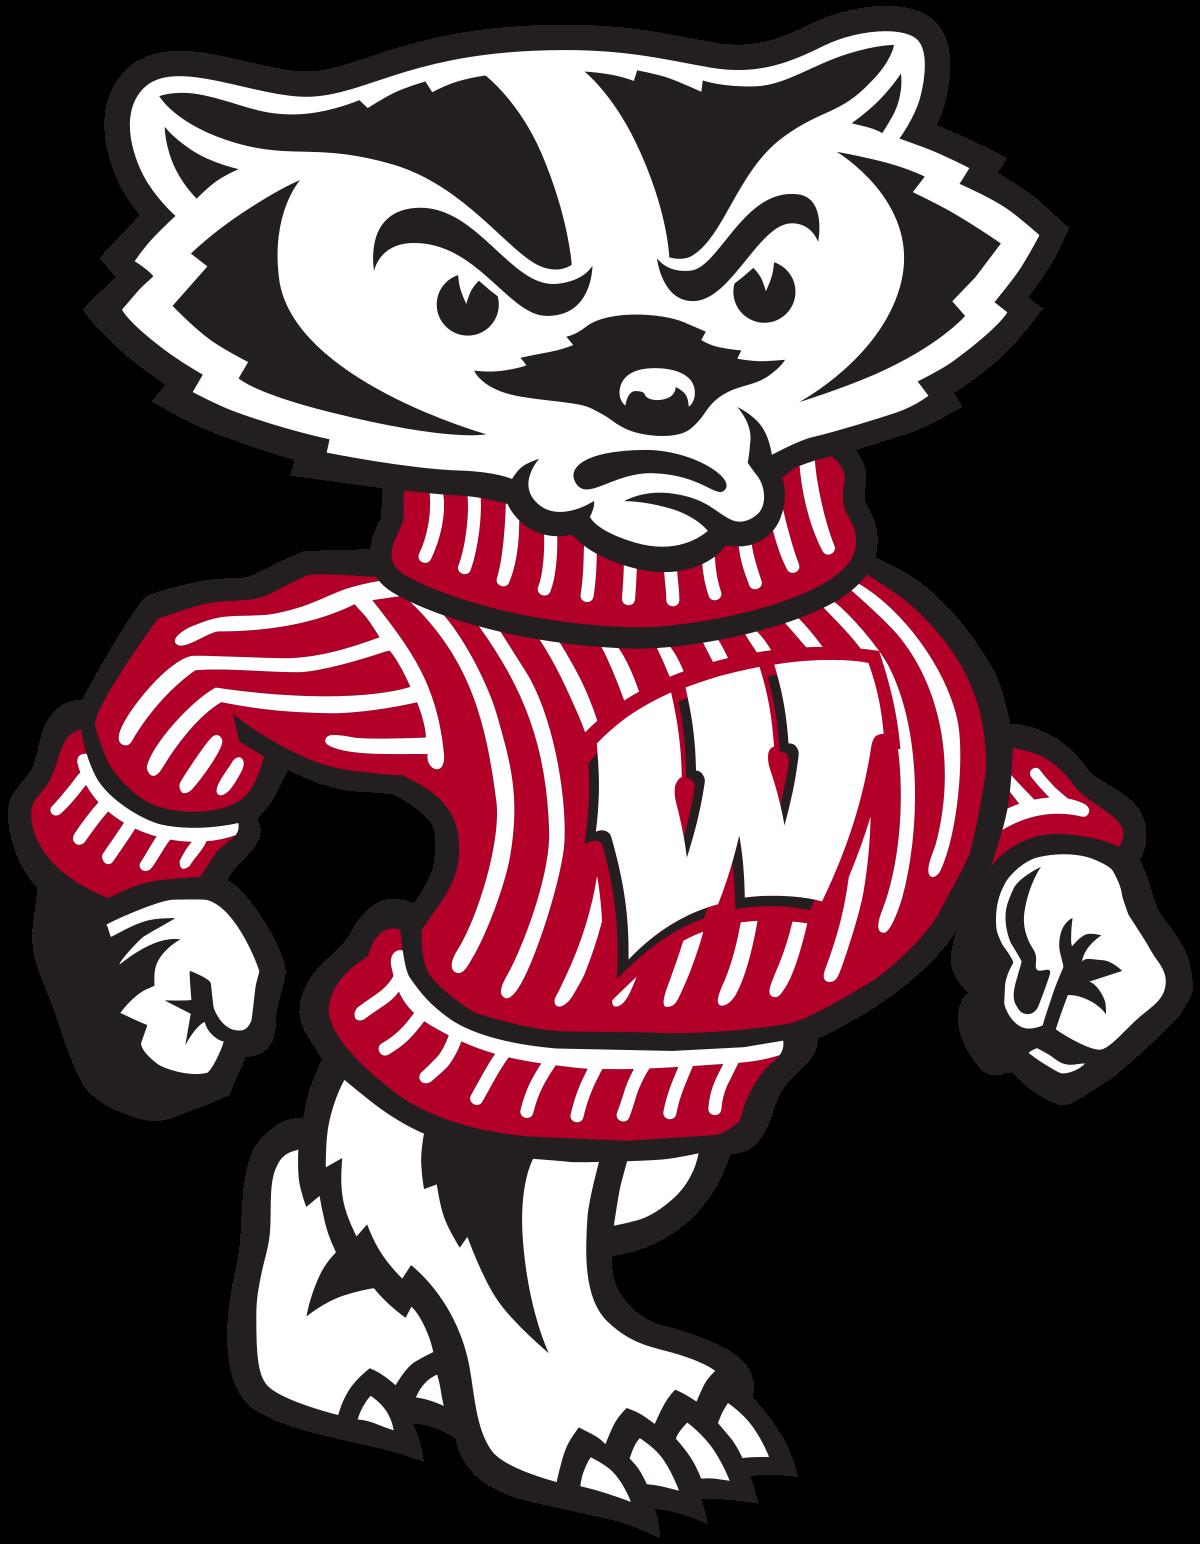 Bucky Badger.